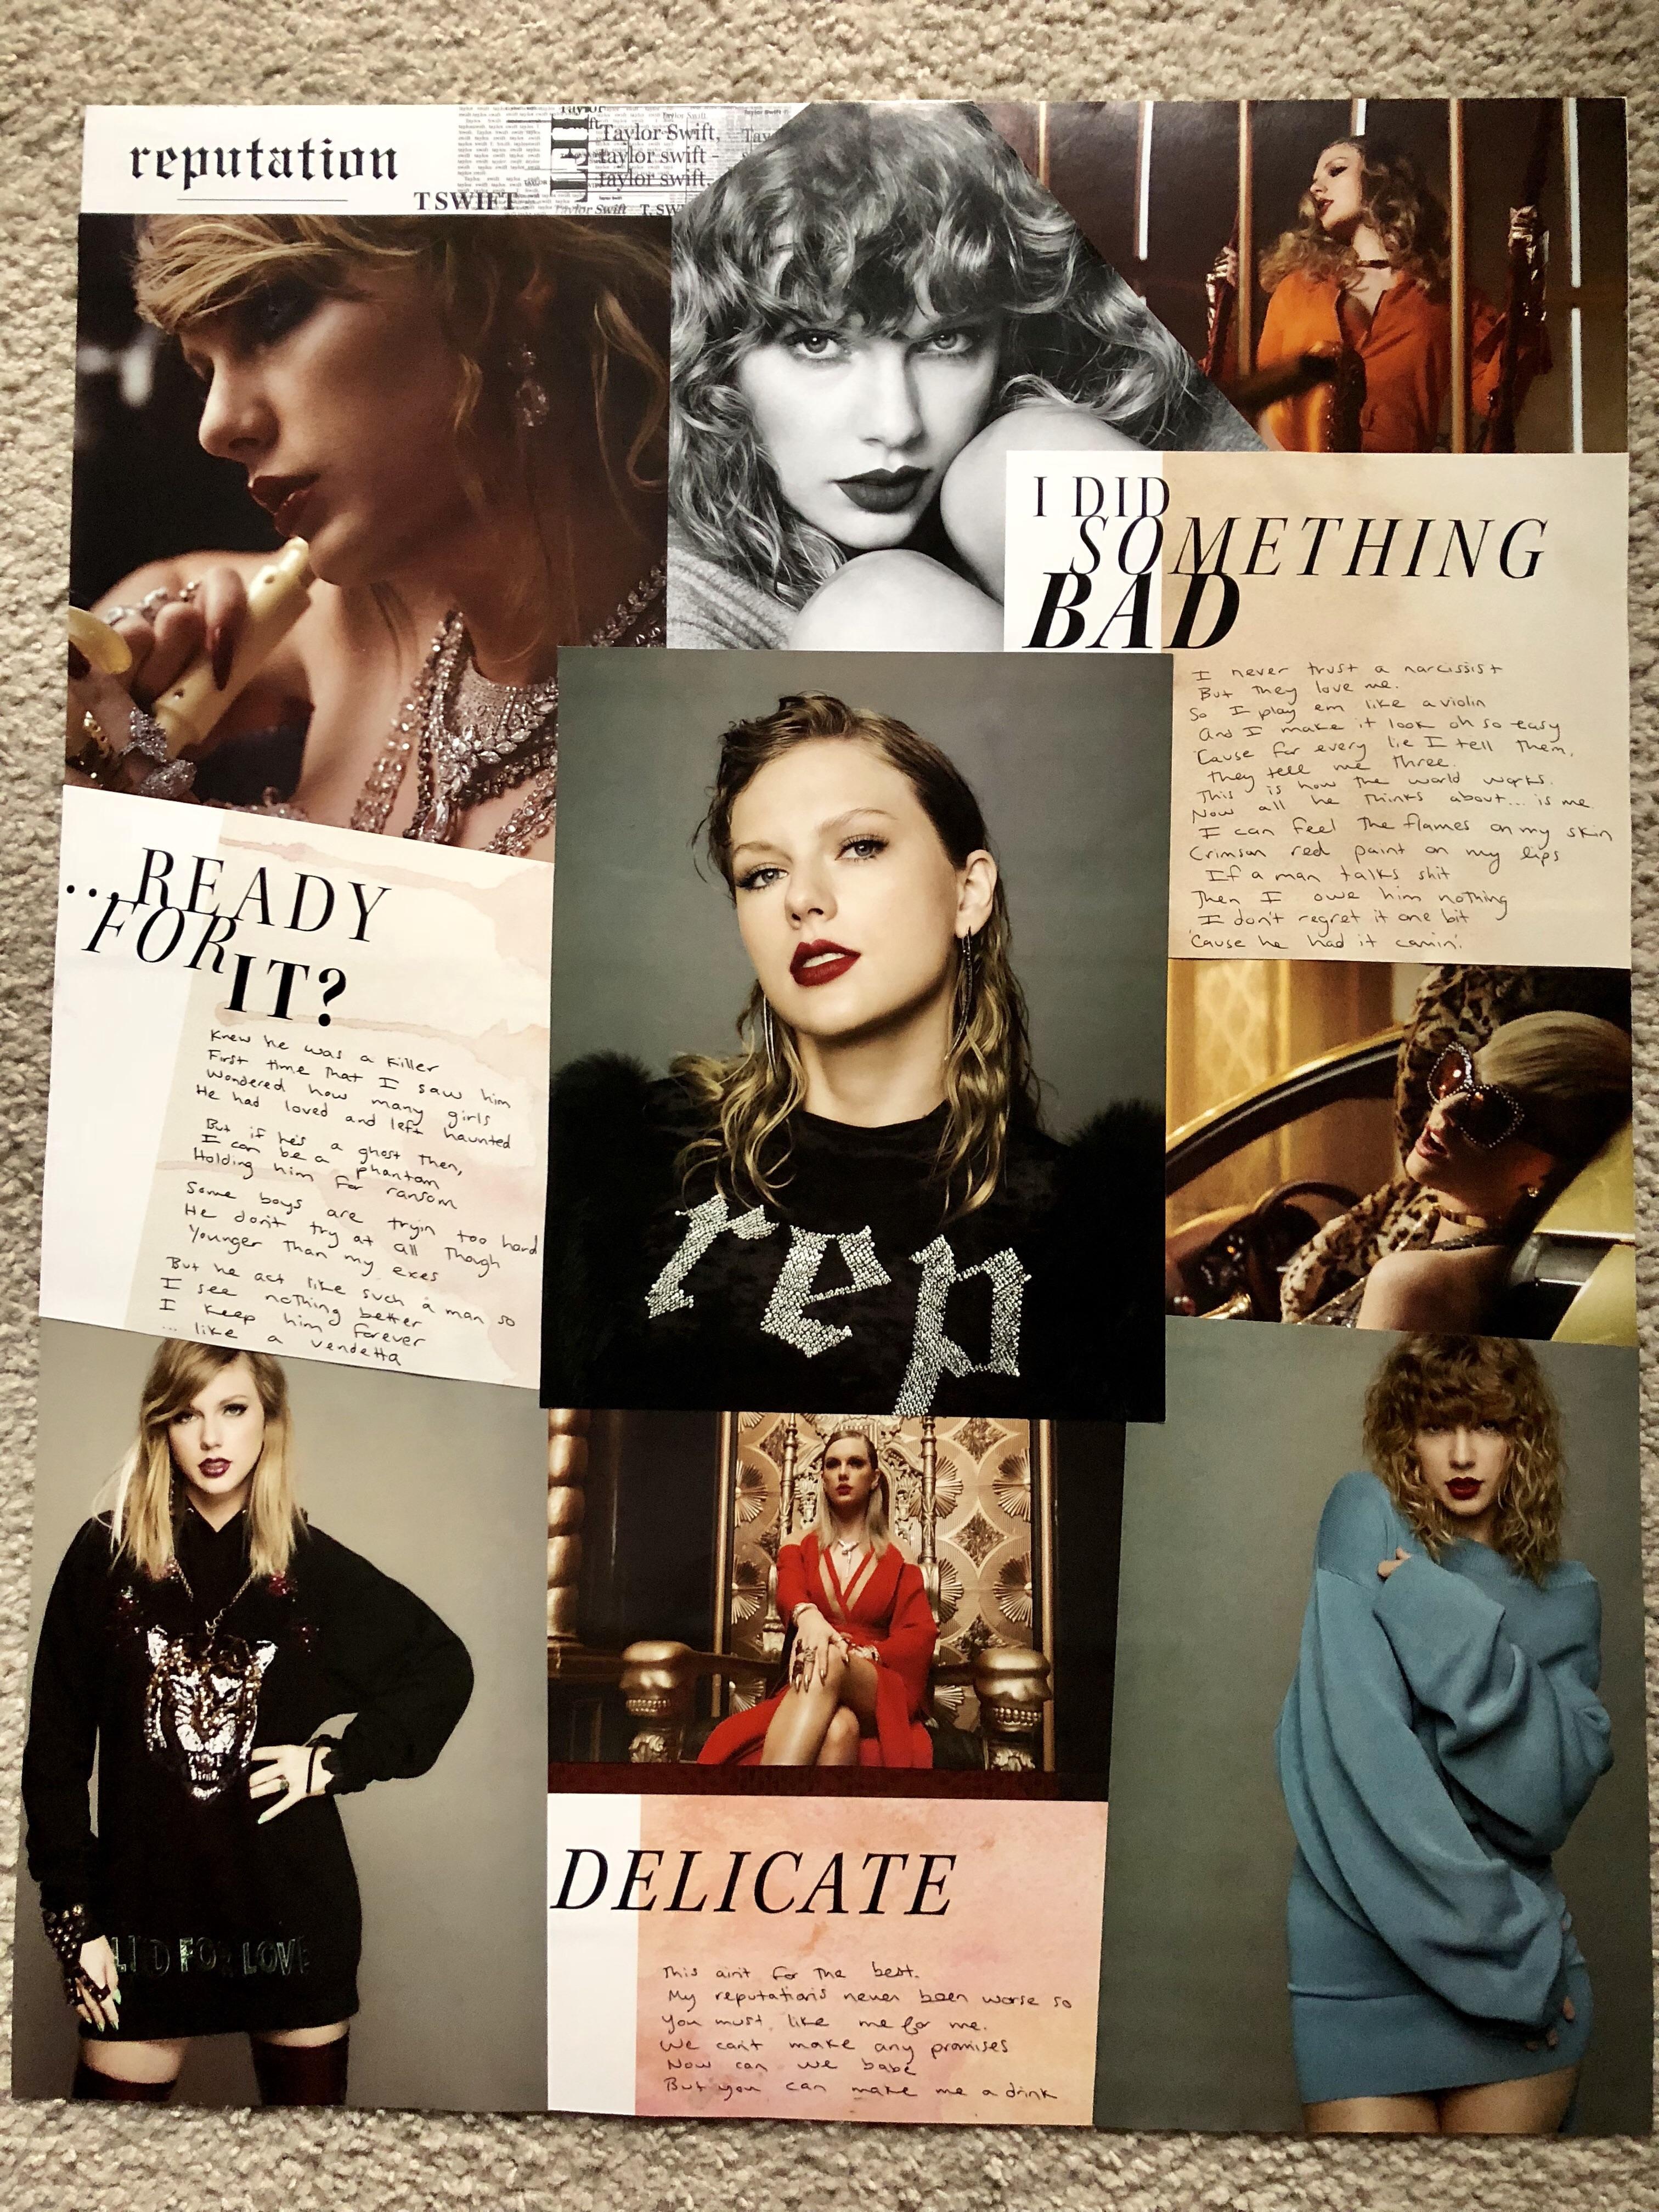 reputation album magazine into a poster